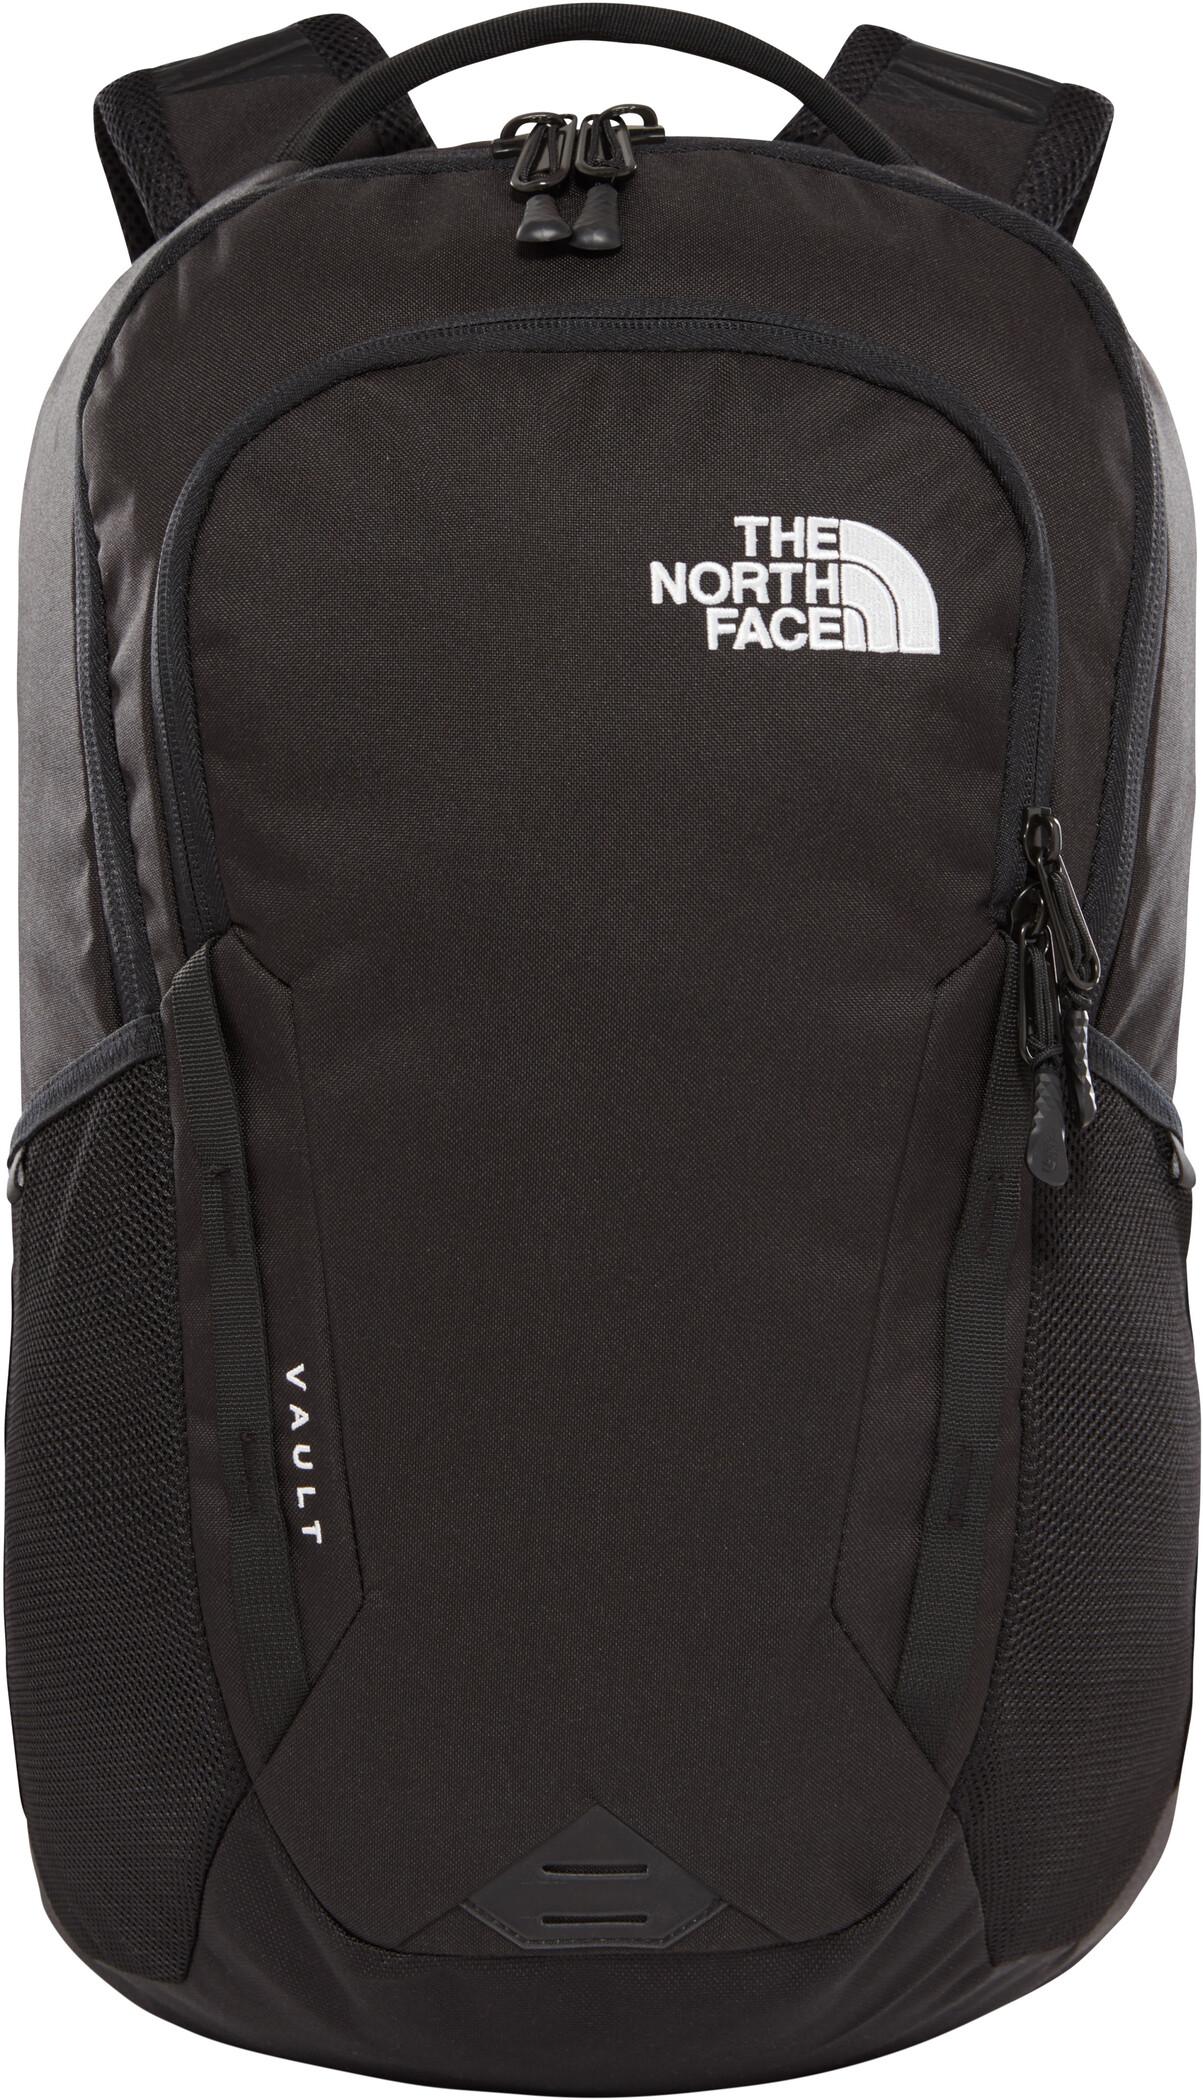 The North Face Vault Rygsæk, tnf black (2019) | Travel bags